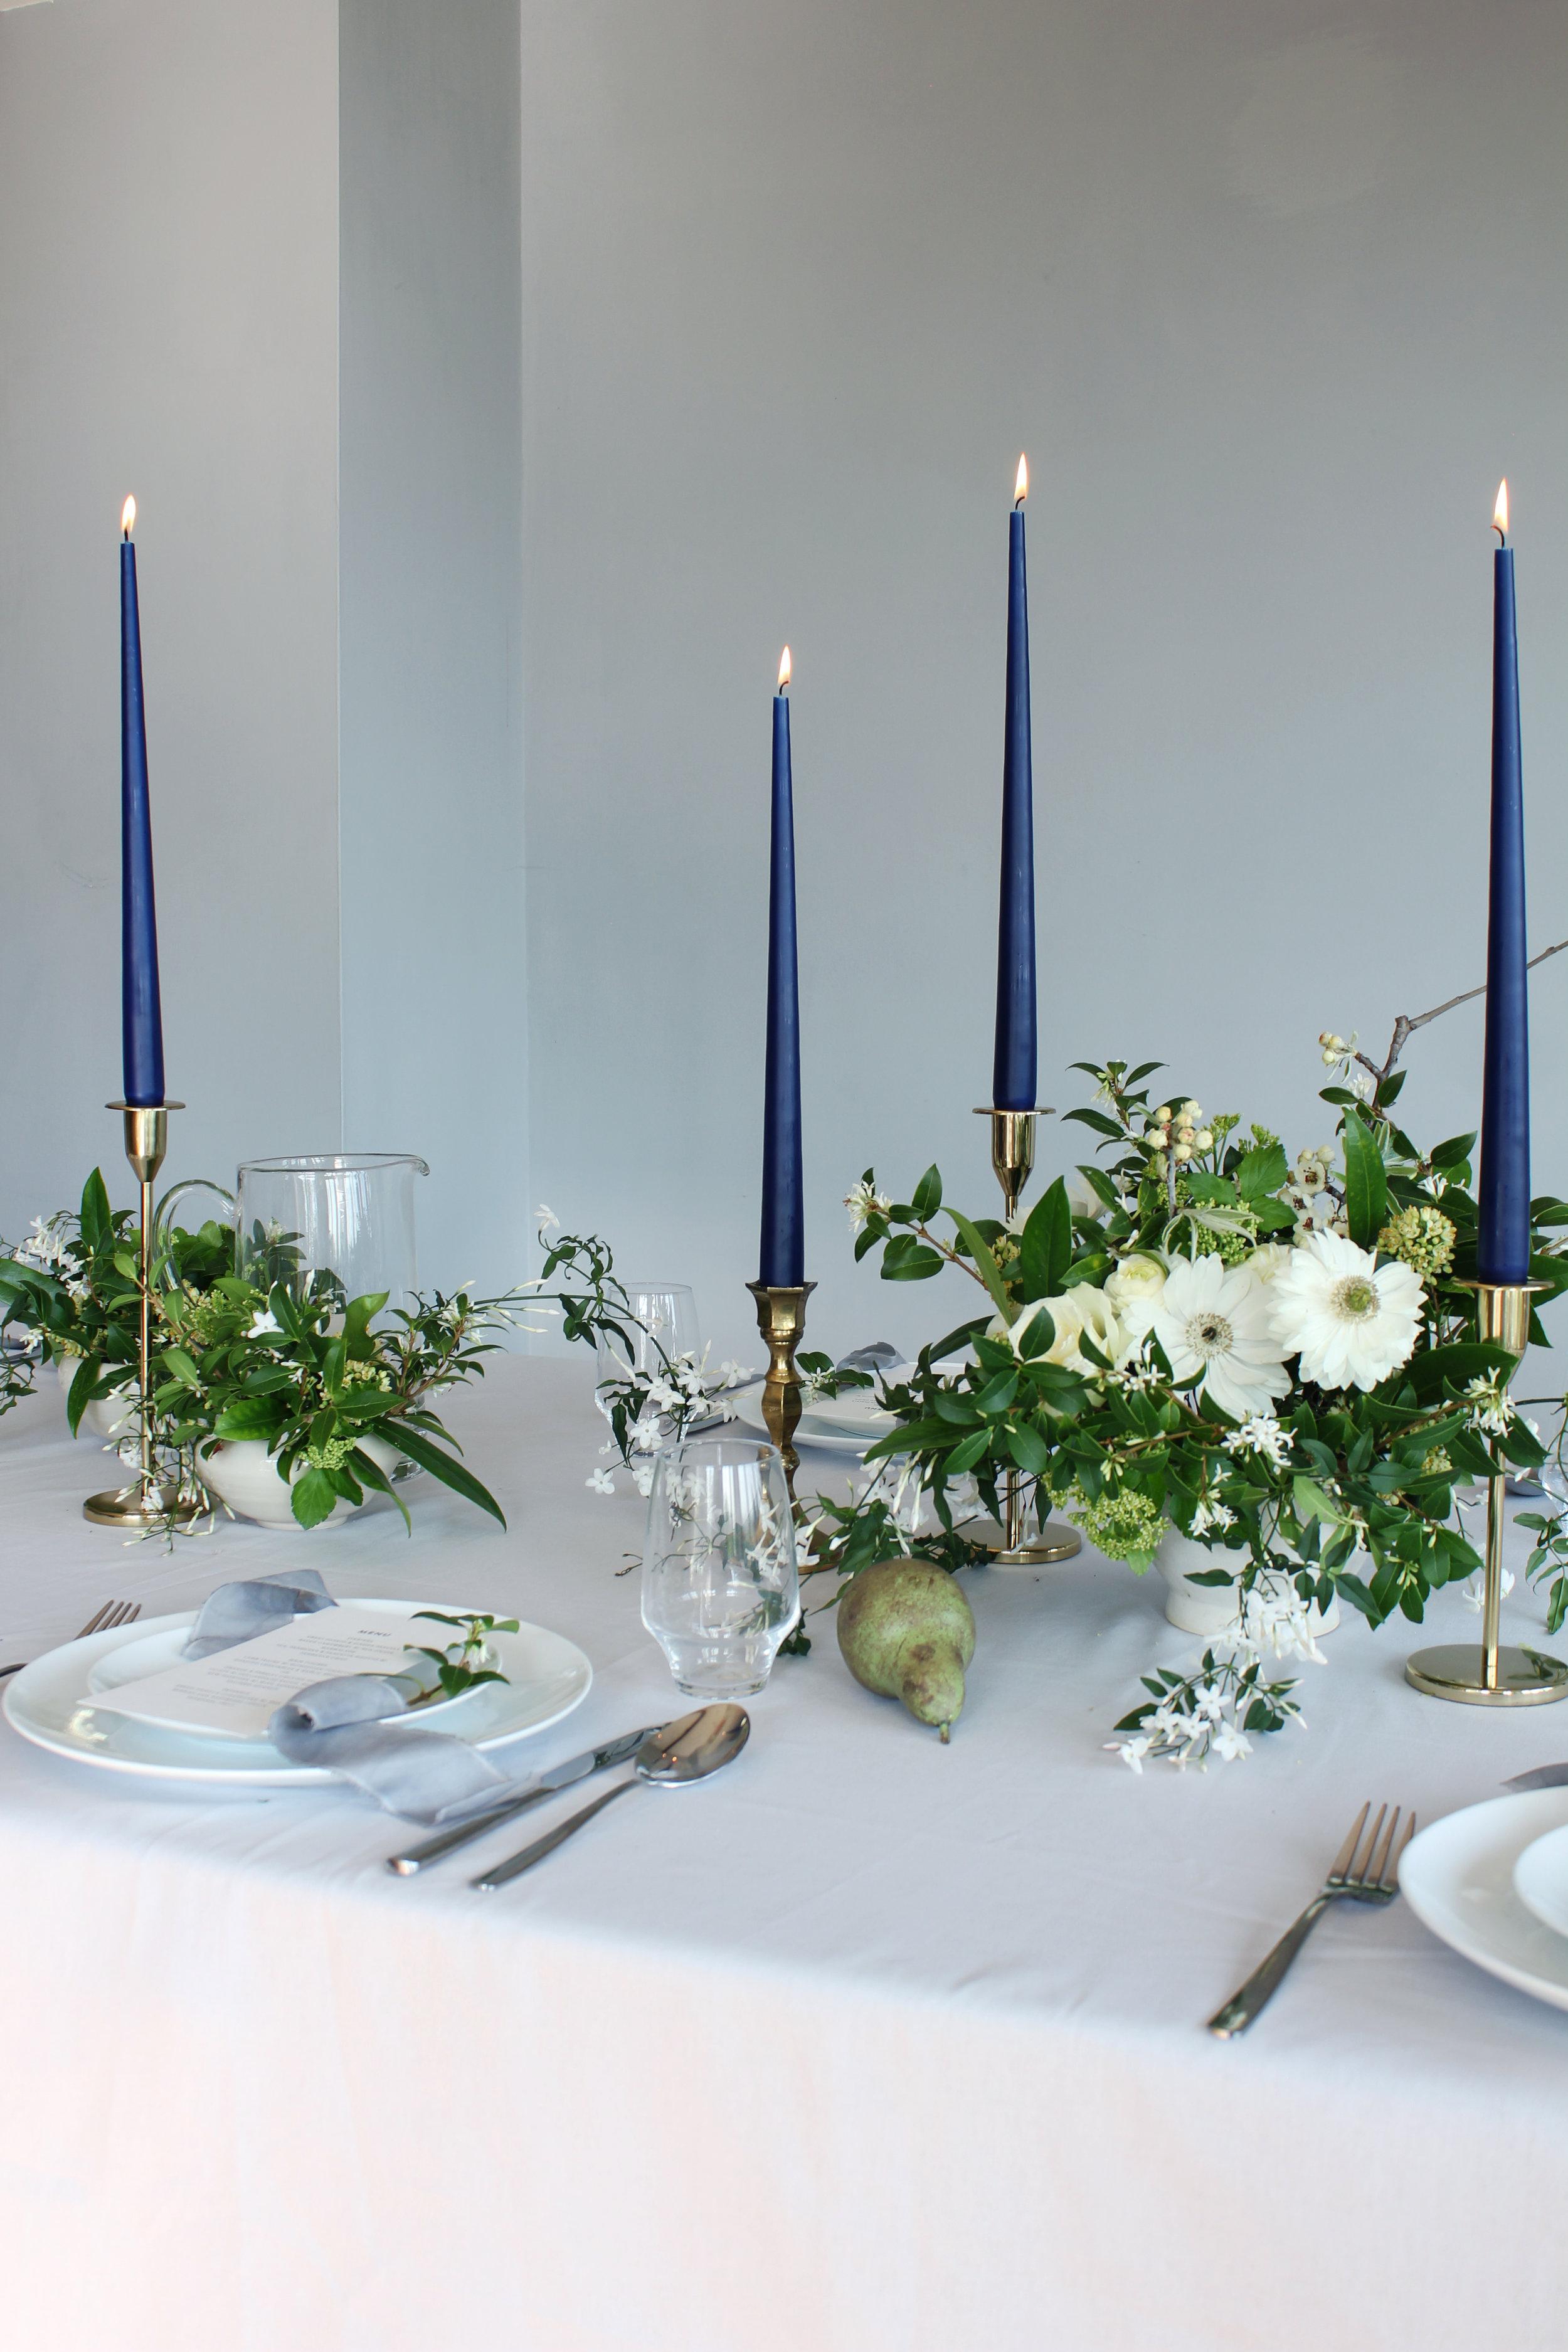 Callie-Pettigrew-Dusky-Blue-Wedding-4.jpg